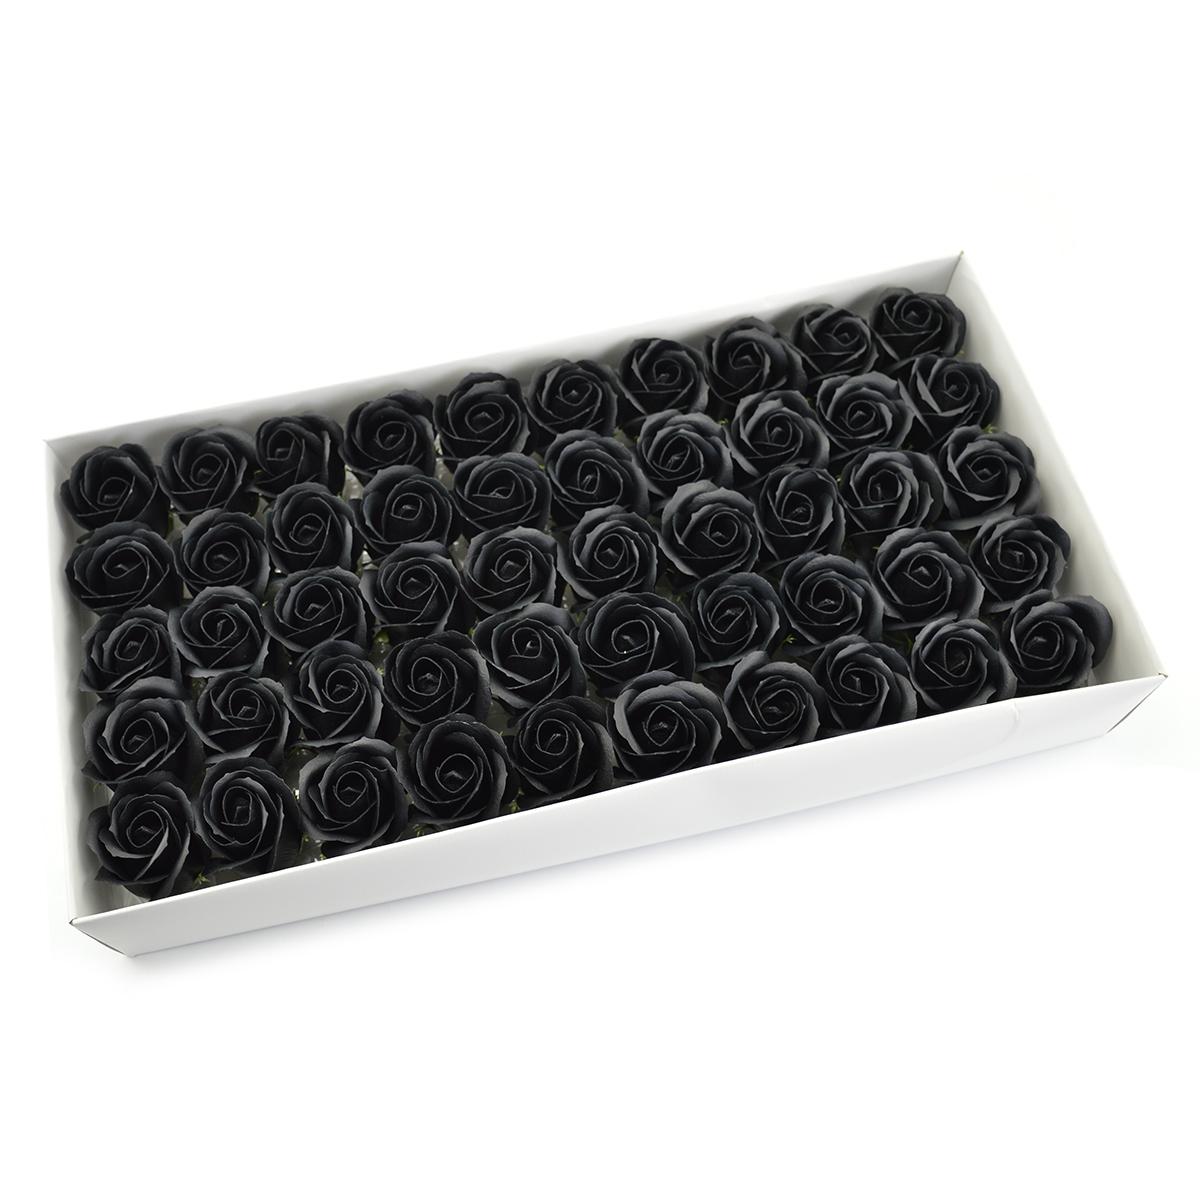 Juego de 50 rosas de jabón aromáticas, toque real, negro